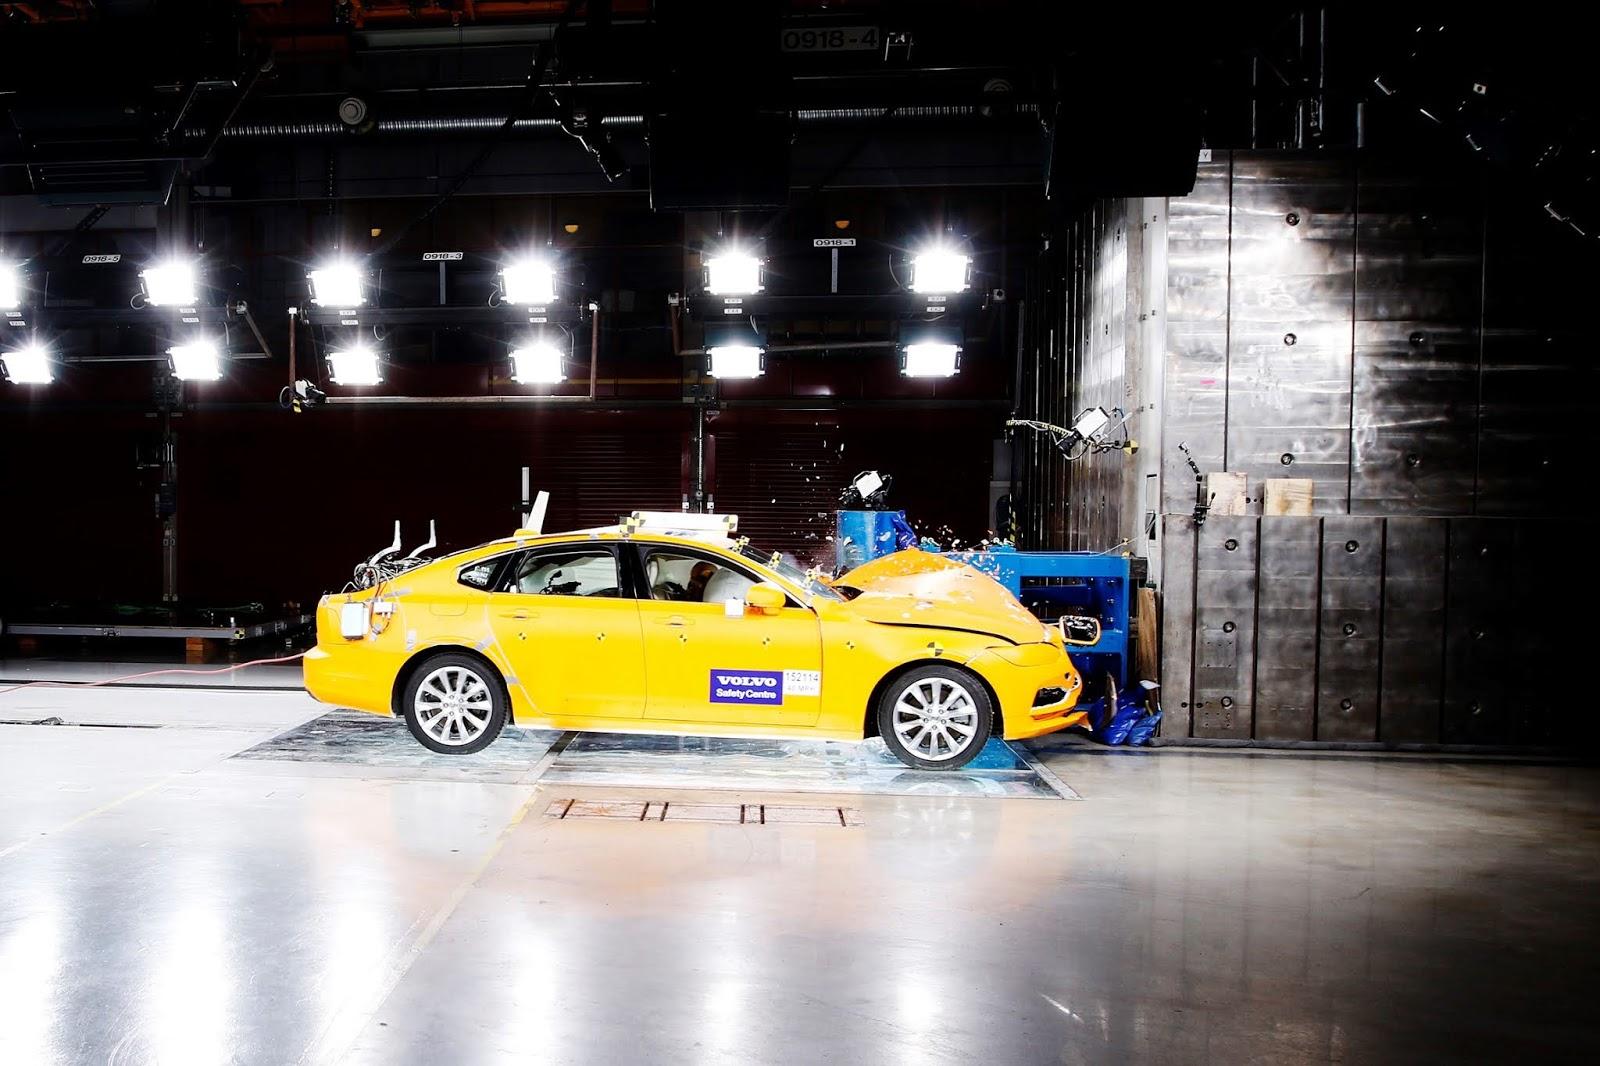 172072 Volvo S90 Small Overlap Crash Test 20 χρόνια Volvo Cars Safety Centre : Δύο δεκαετίες, σώζει ζωές crash tests, Volvo, Volvo Cars, ασφάλεια, ειδήσεις, καινοτομία